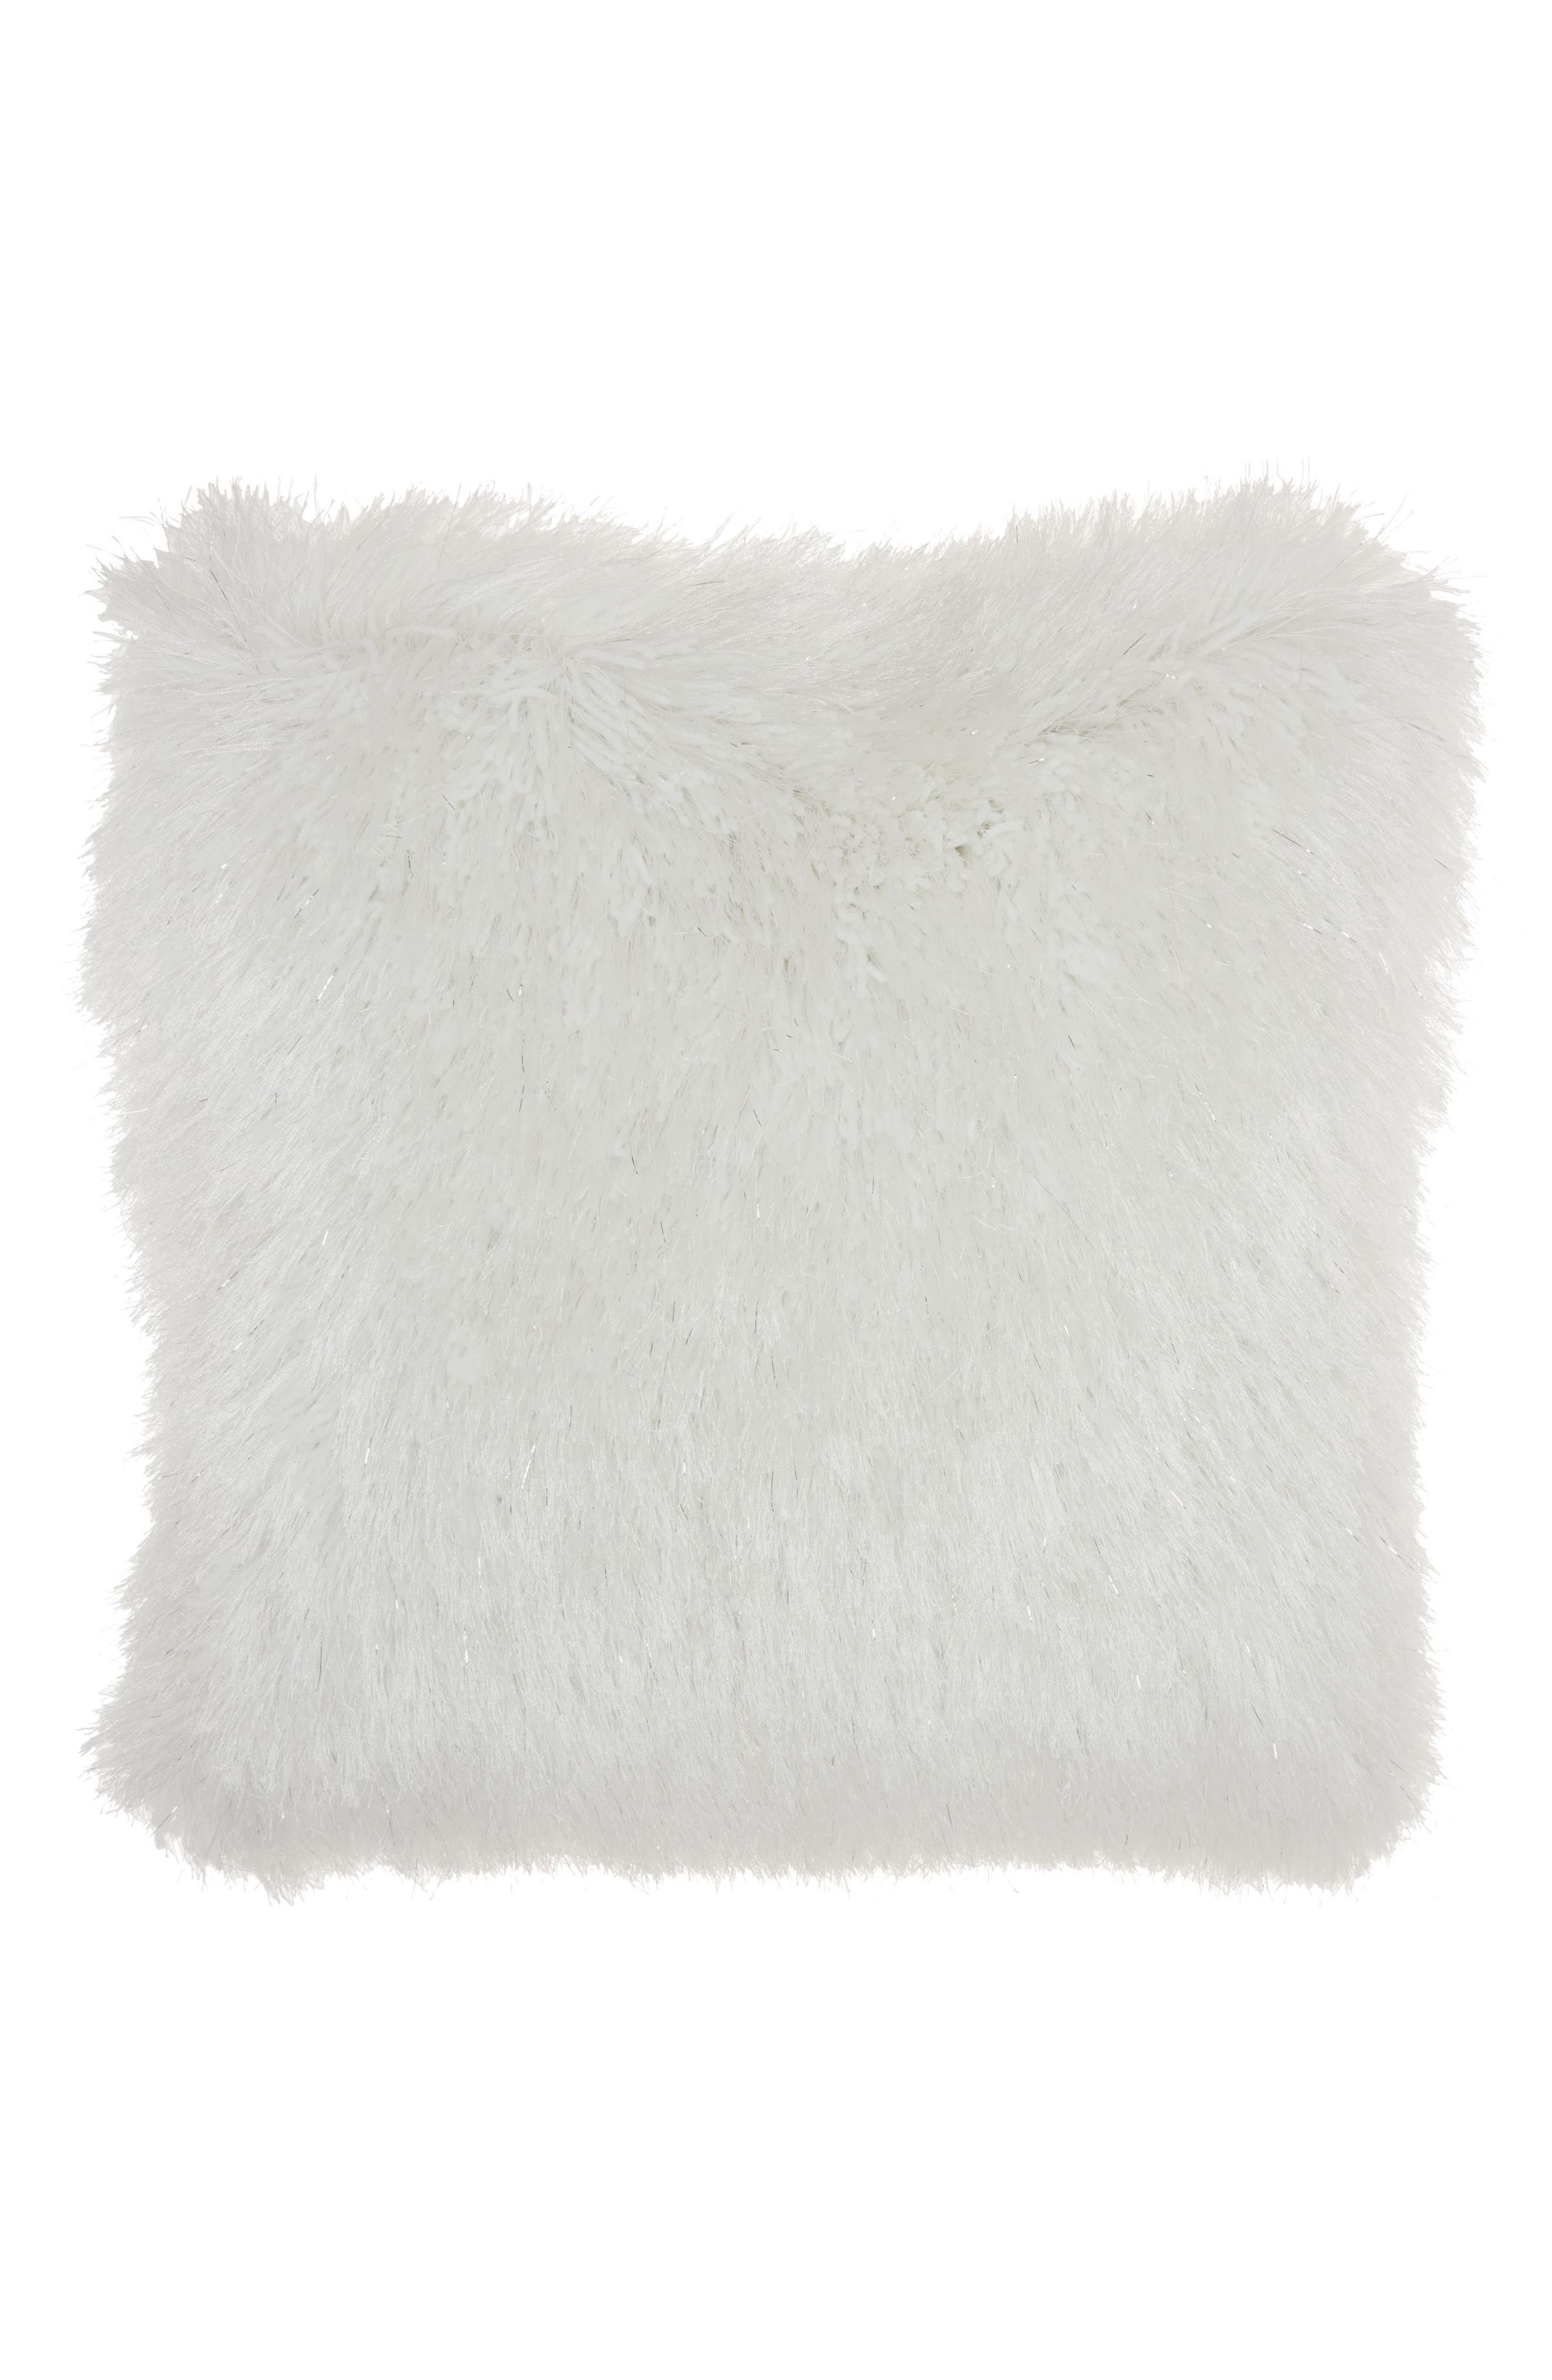 Shag Pillow,                             Main thumbnail 1, color,                             WHITE